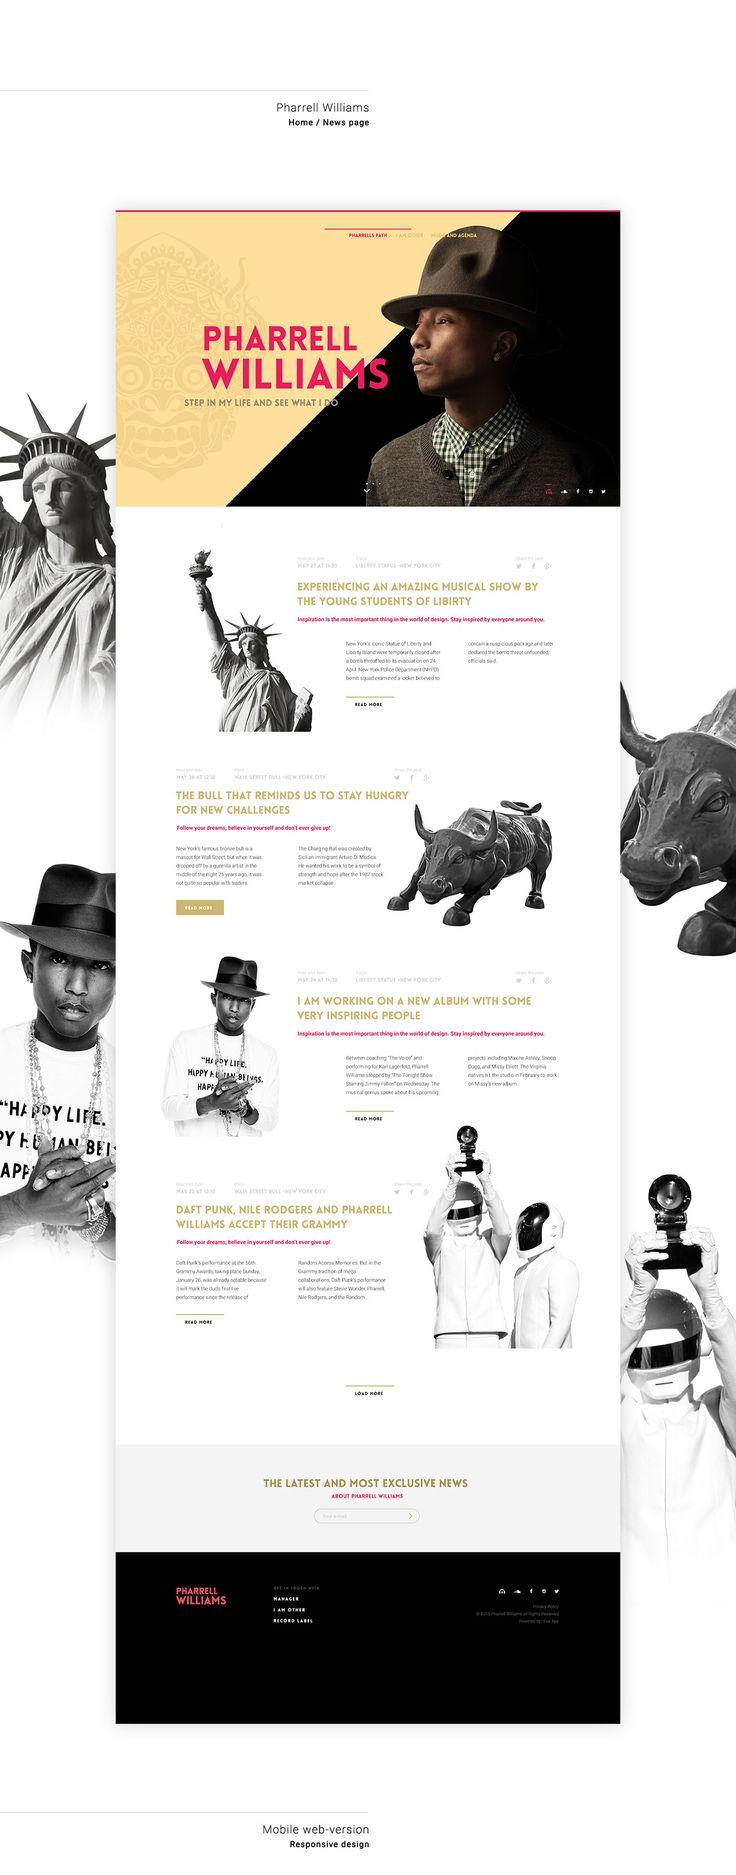 Beautiful Digital Branding: Discover the World of Pharrell Williams | Abduzeedo Design Inspiration